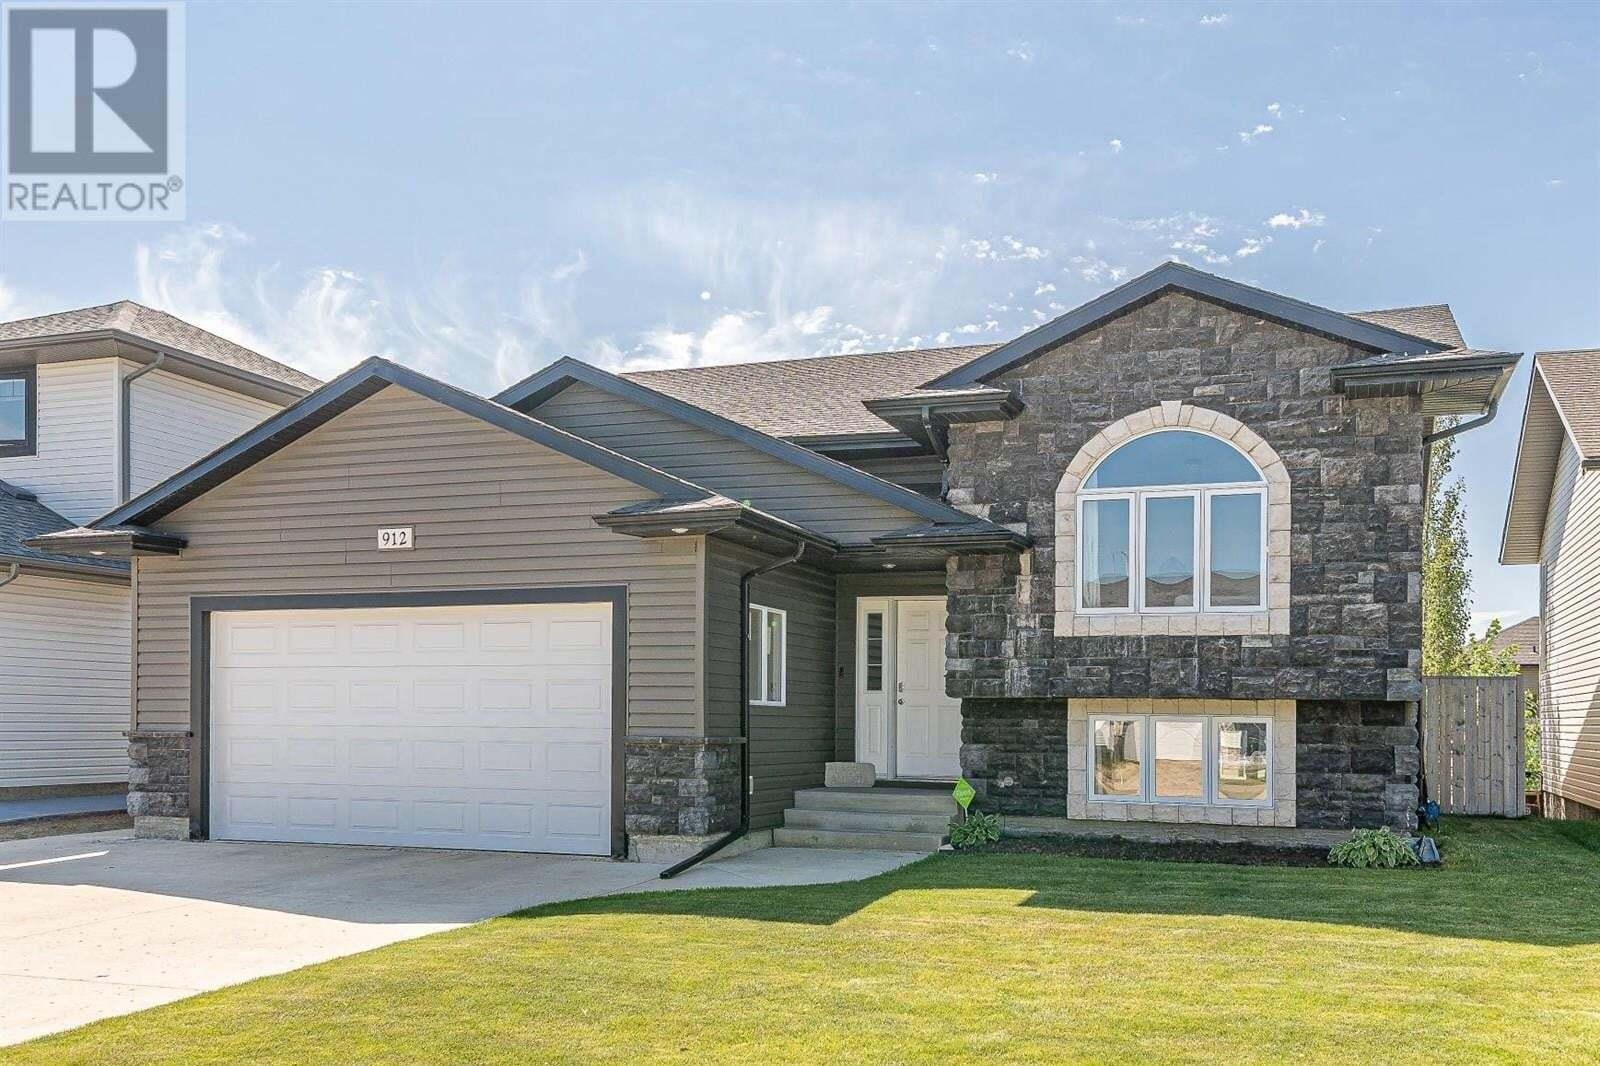 House for sale at 912 Coppermine Wy Martensville Saskatchewan - MLS: SK819191